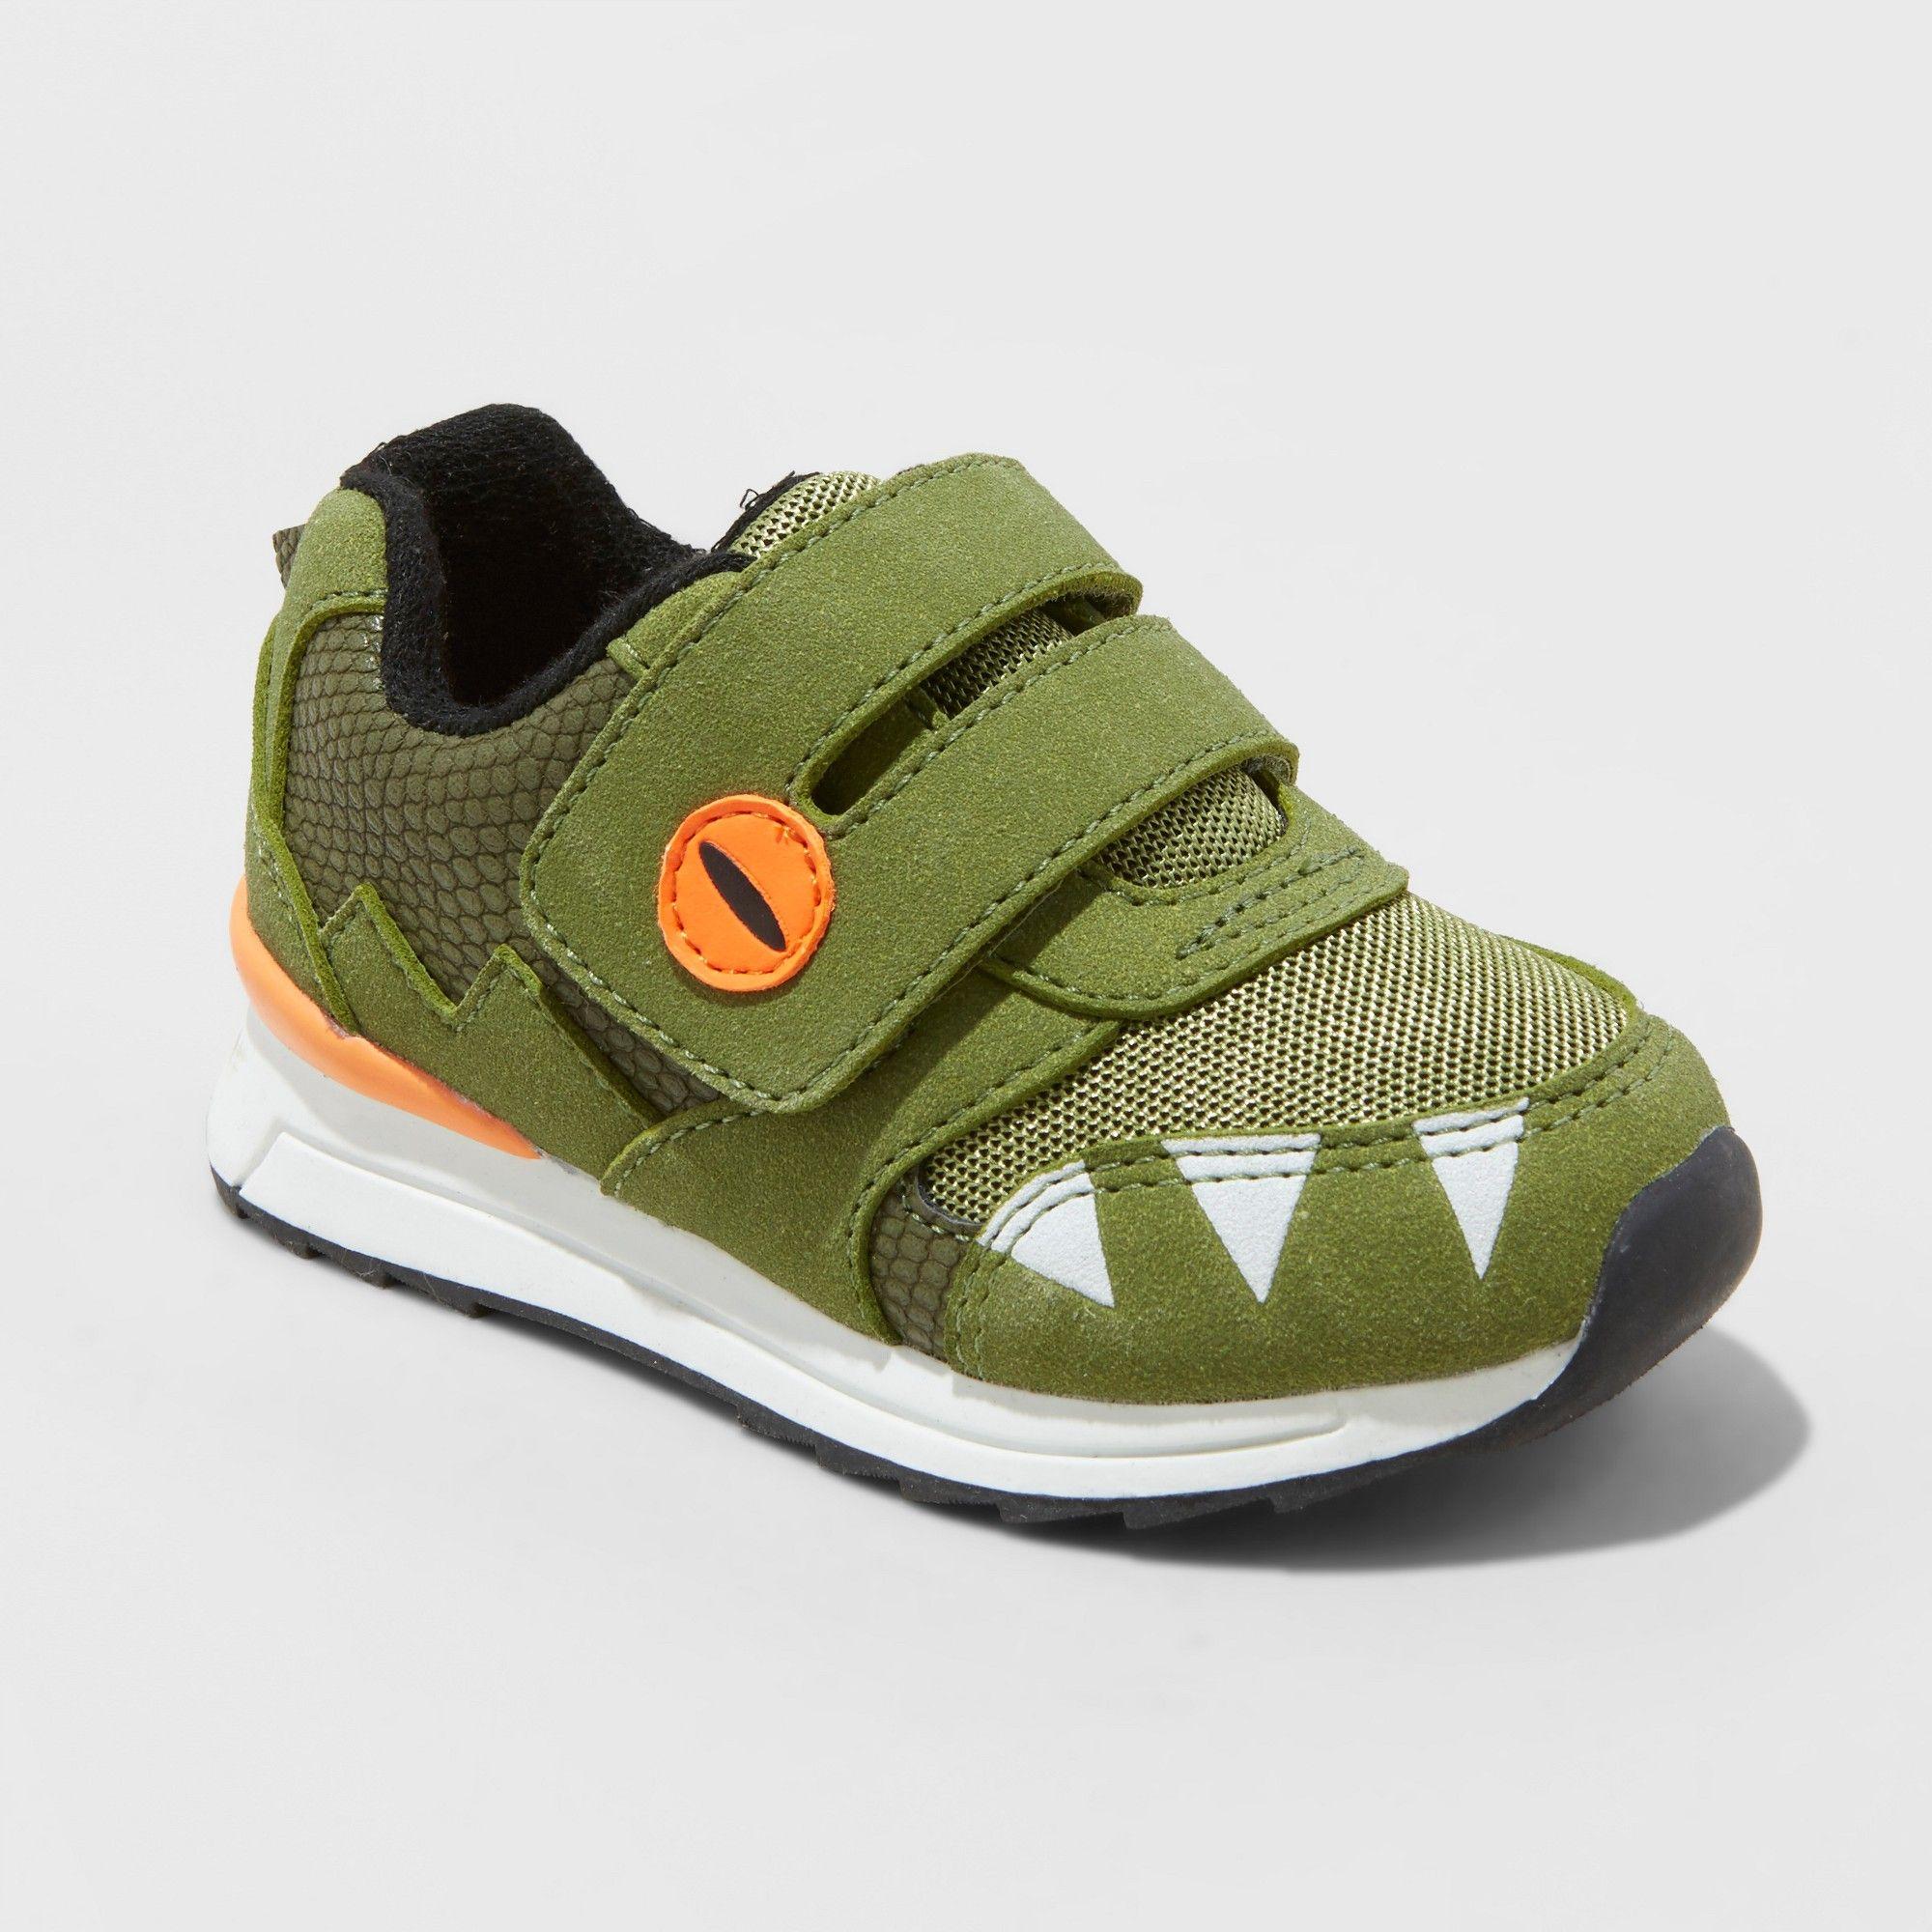 Toddler Boys Monte Sneakers Cat Jack Green 6 Toddler Shoes Sneakers Toddler Boys